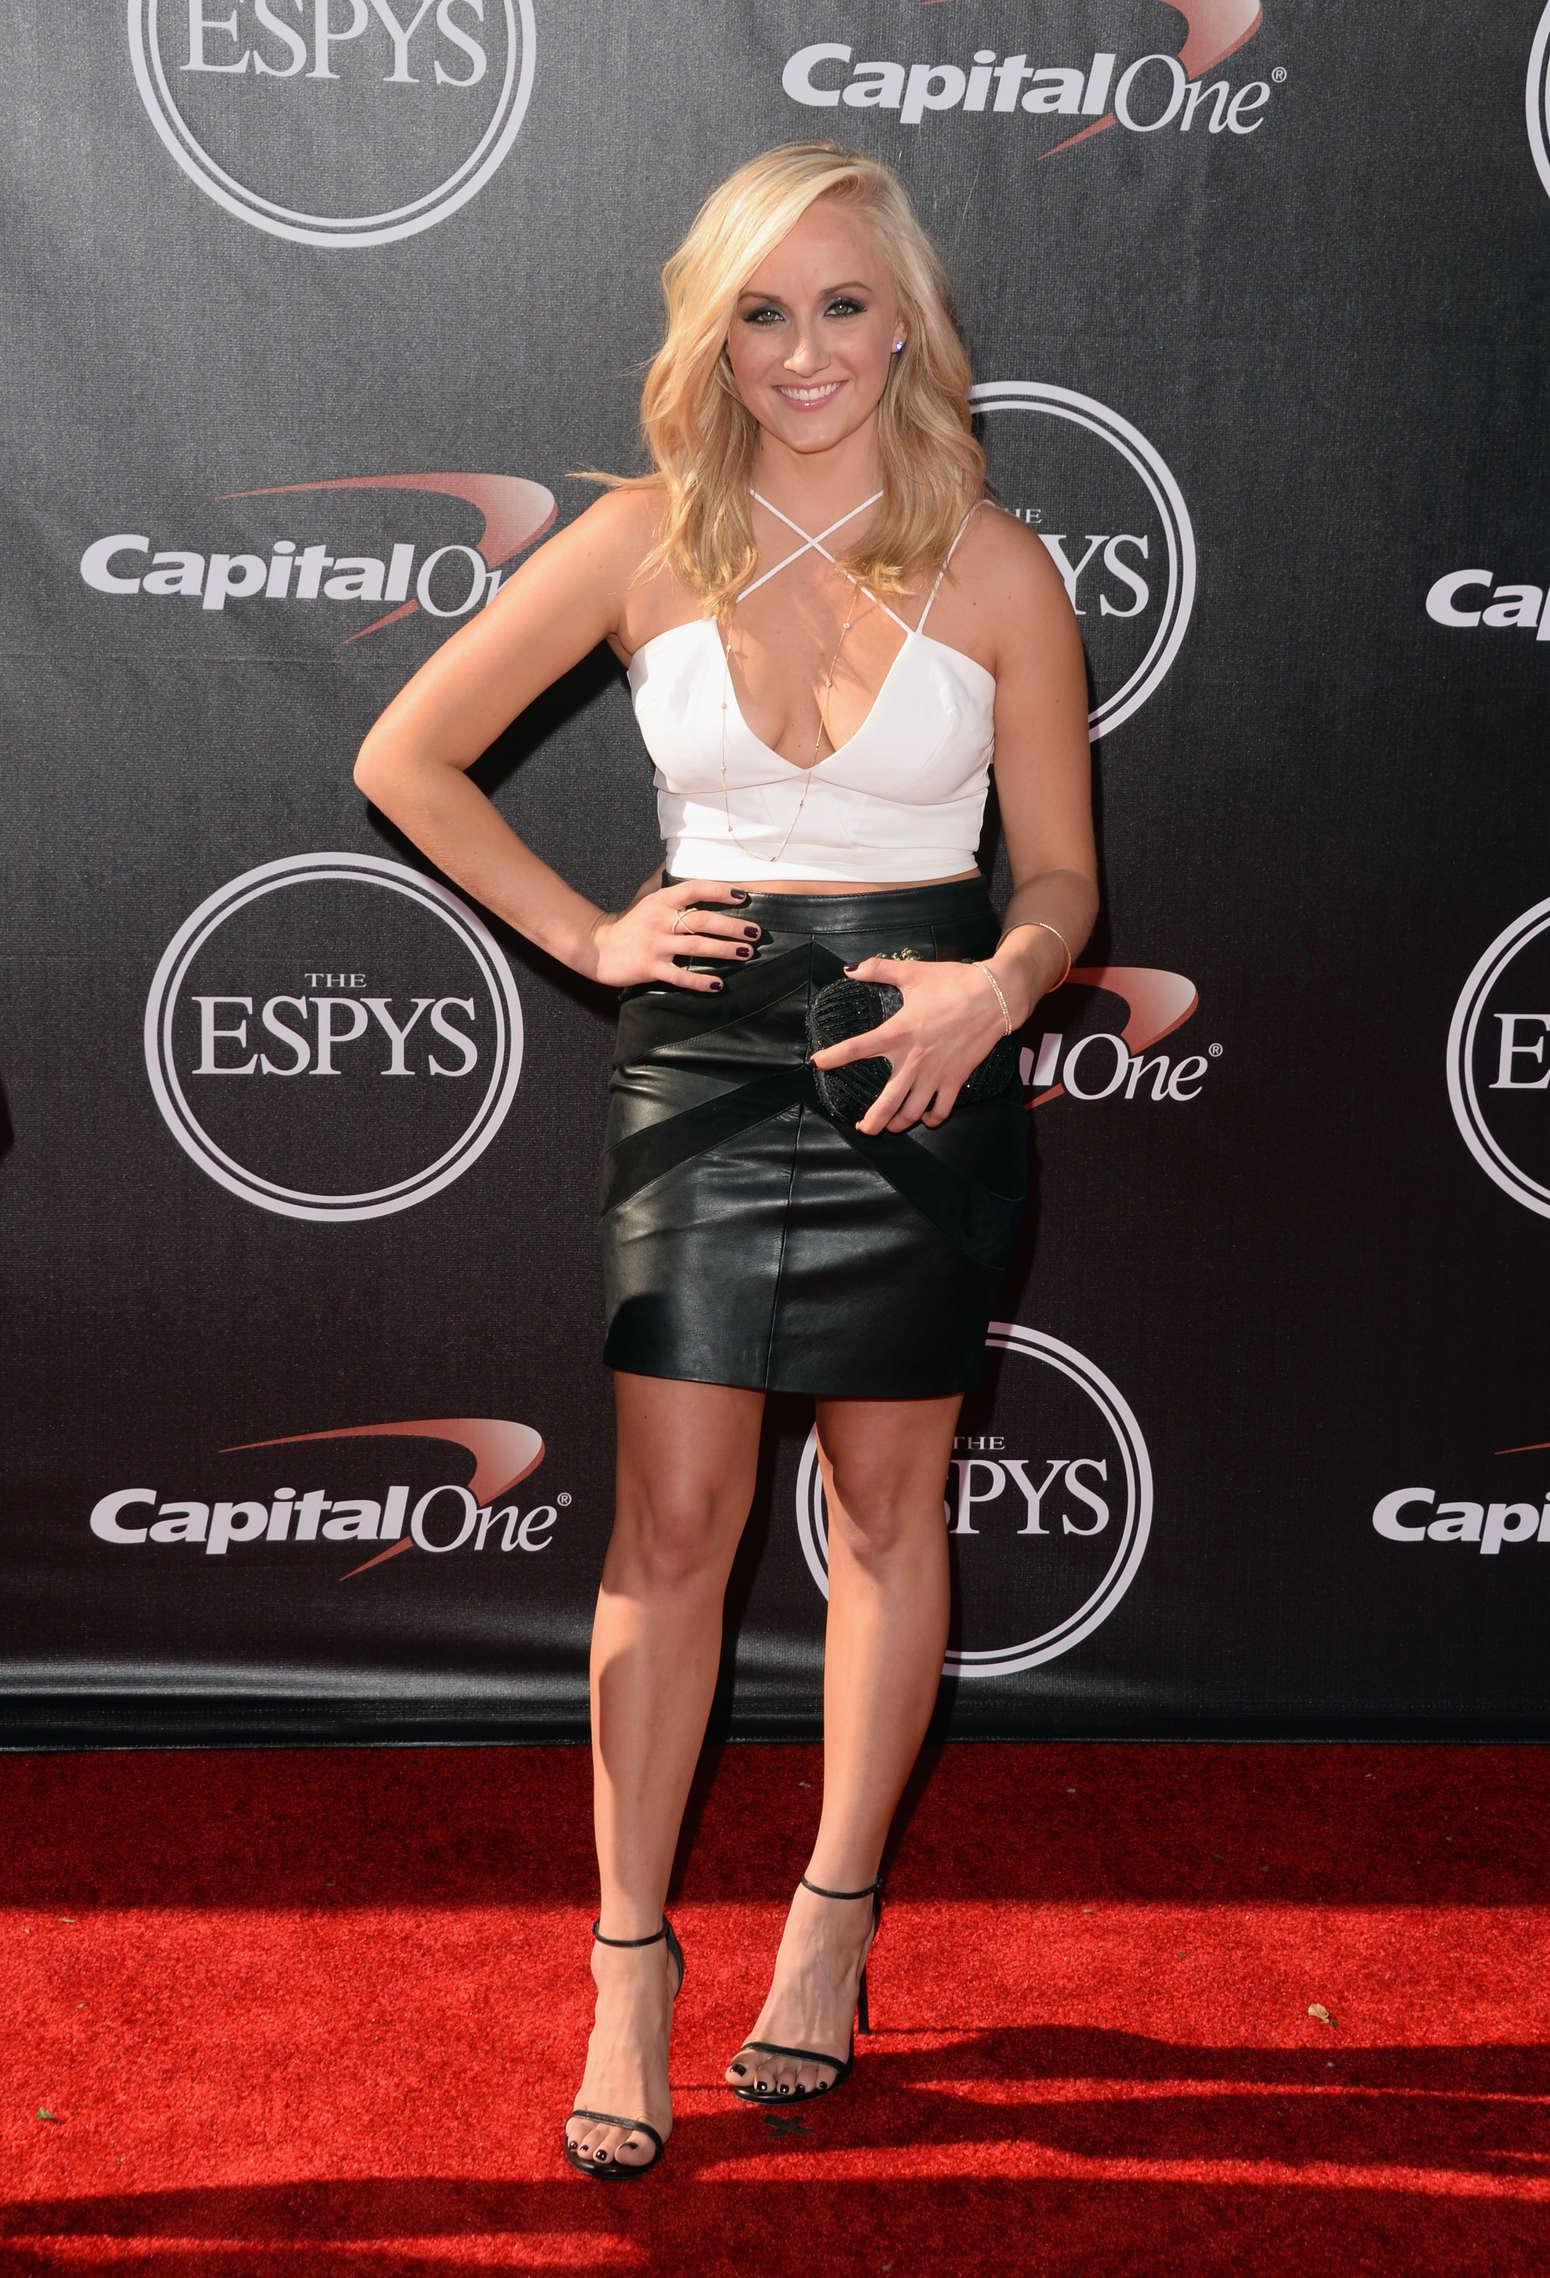 Nastia Liukin at ESPYS in Los Angeles